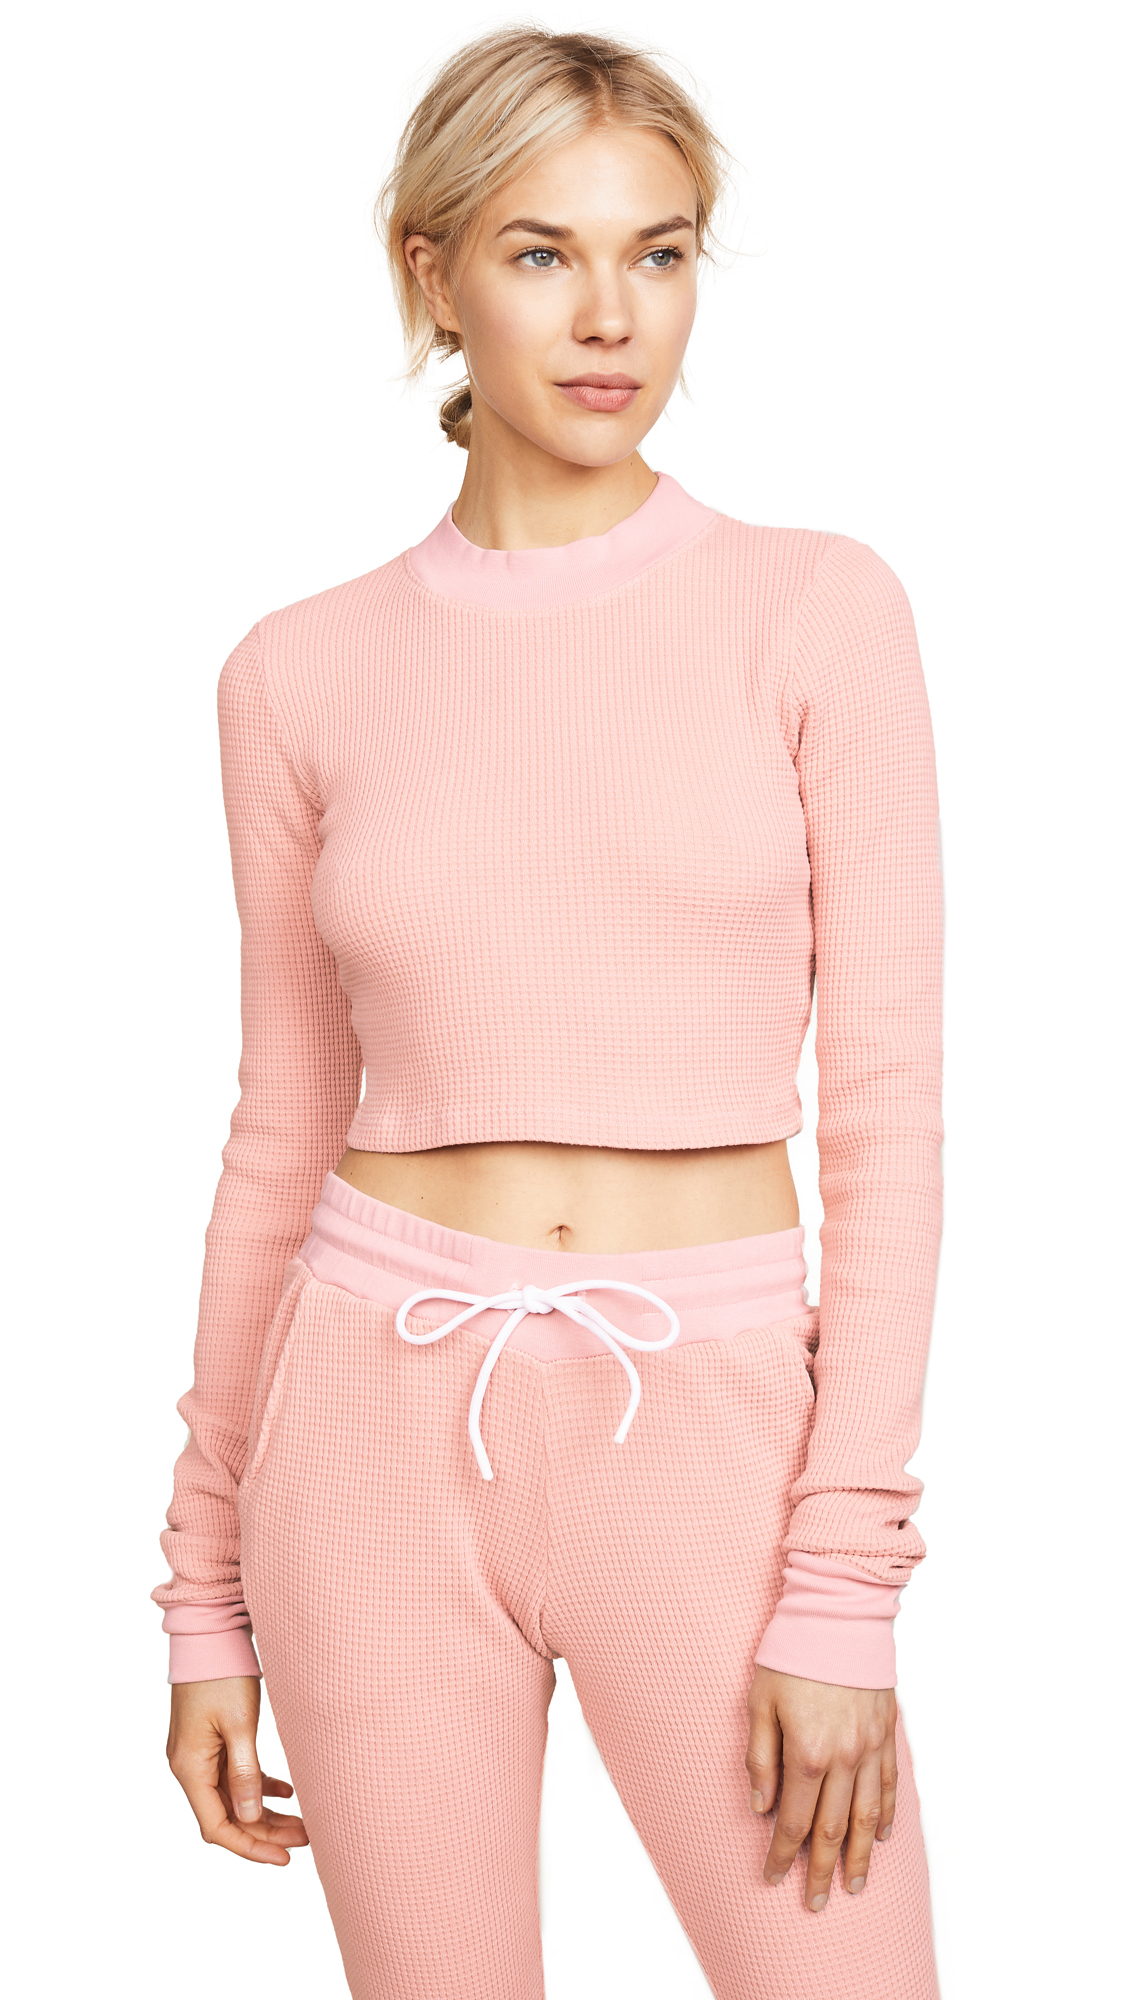 Cotton Citizen Monaco Crop Shirt In Blush